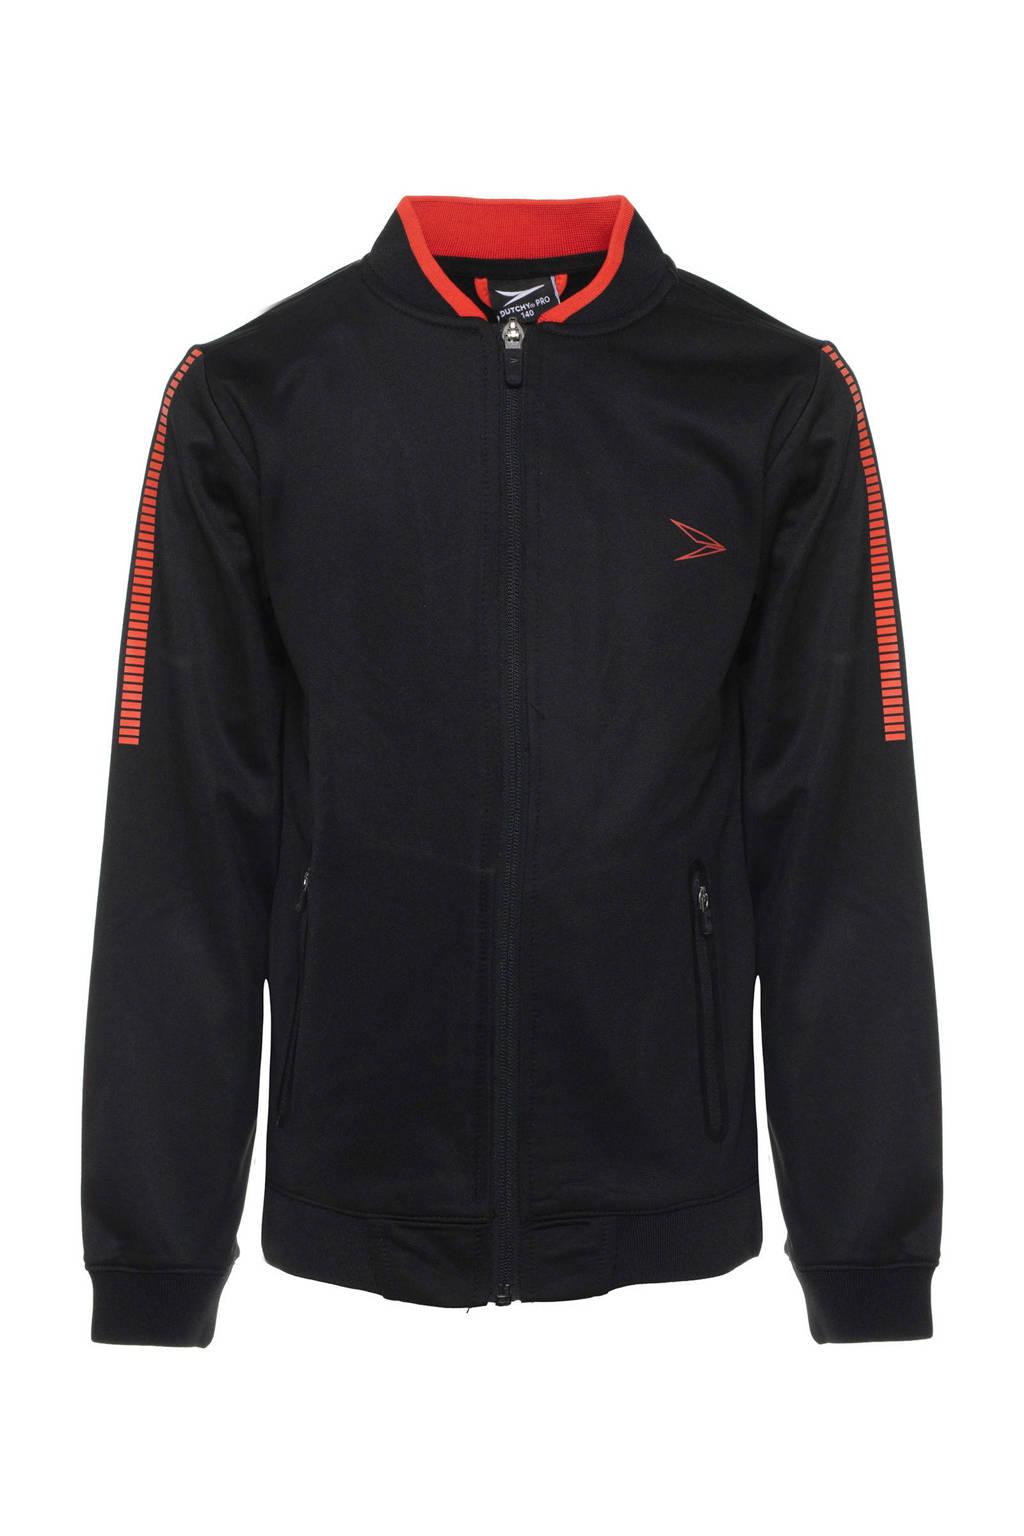 Scapino   sportvest zwart/rood, Zwart/rood